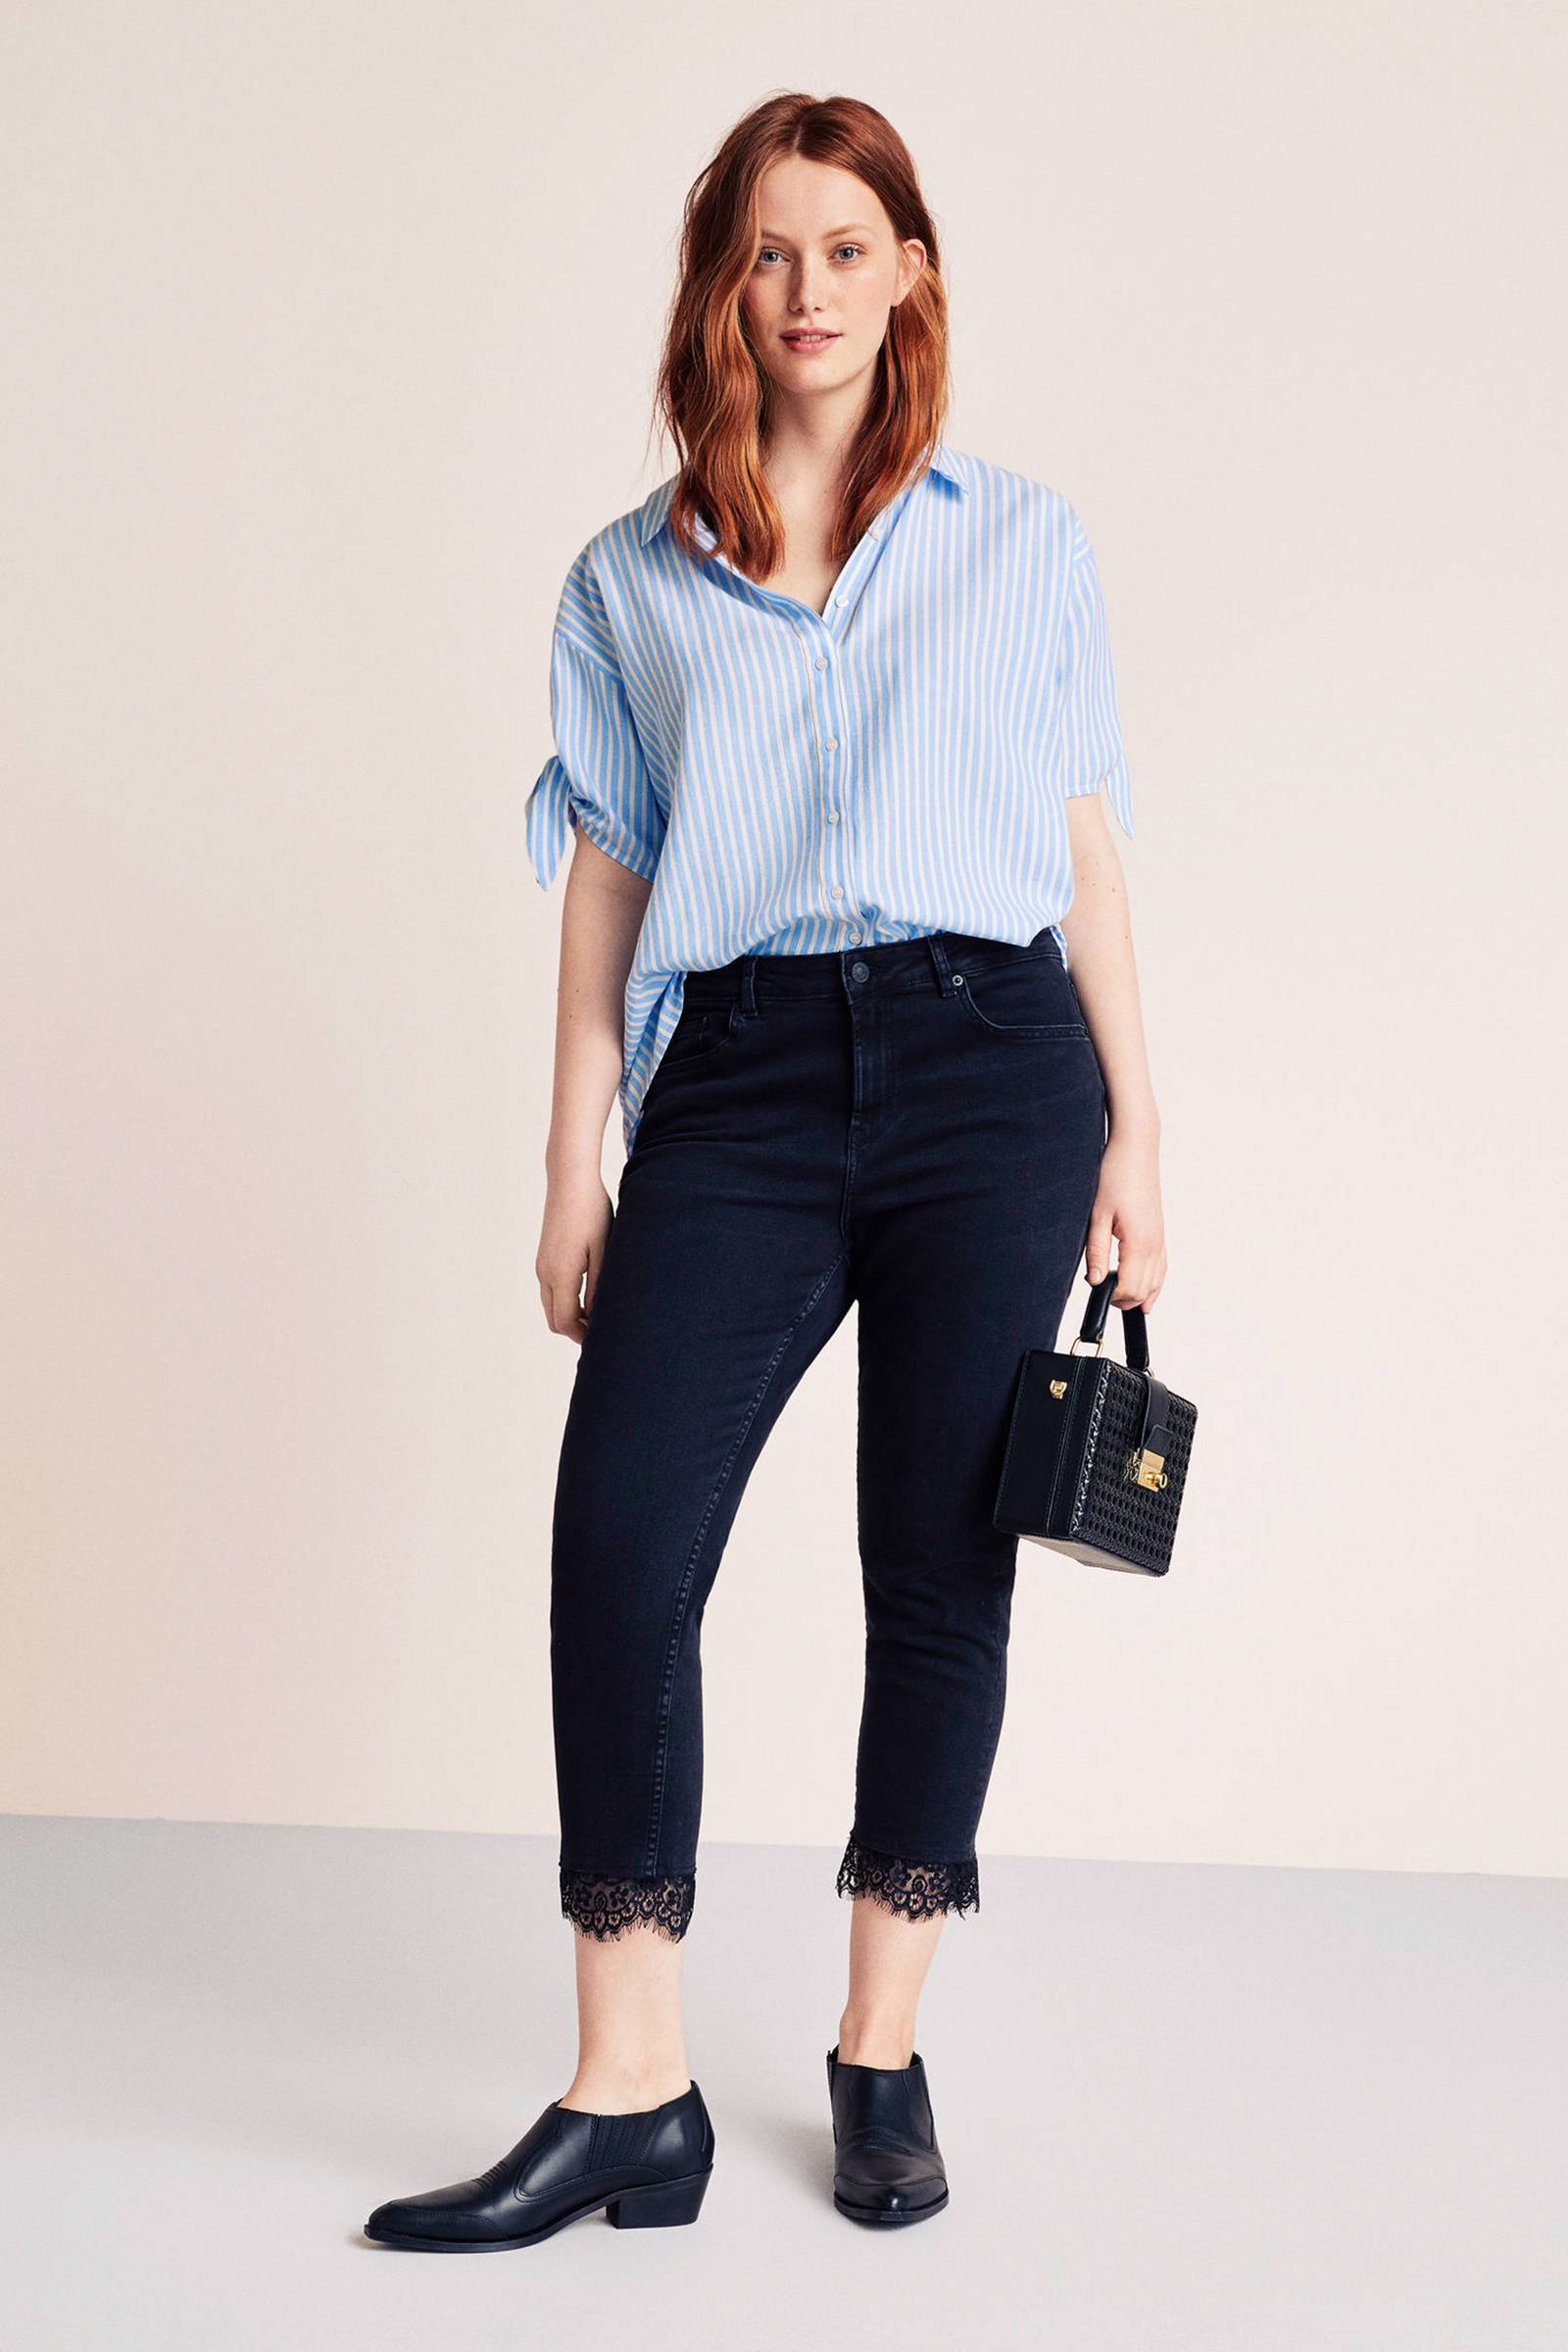 blouse blauw wit gestreept